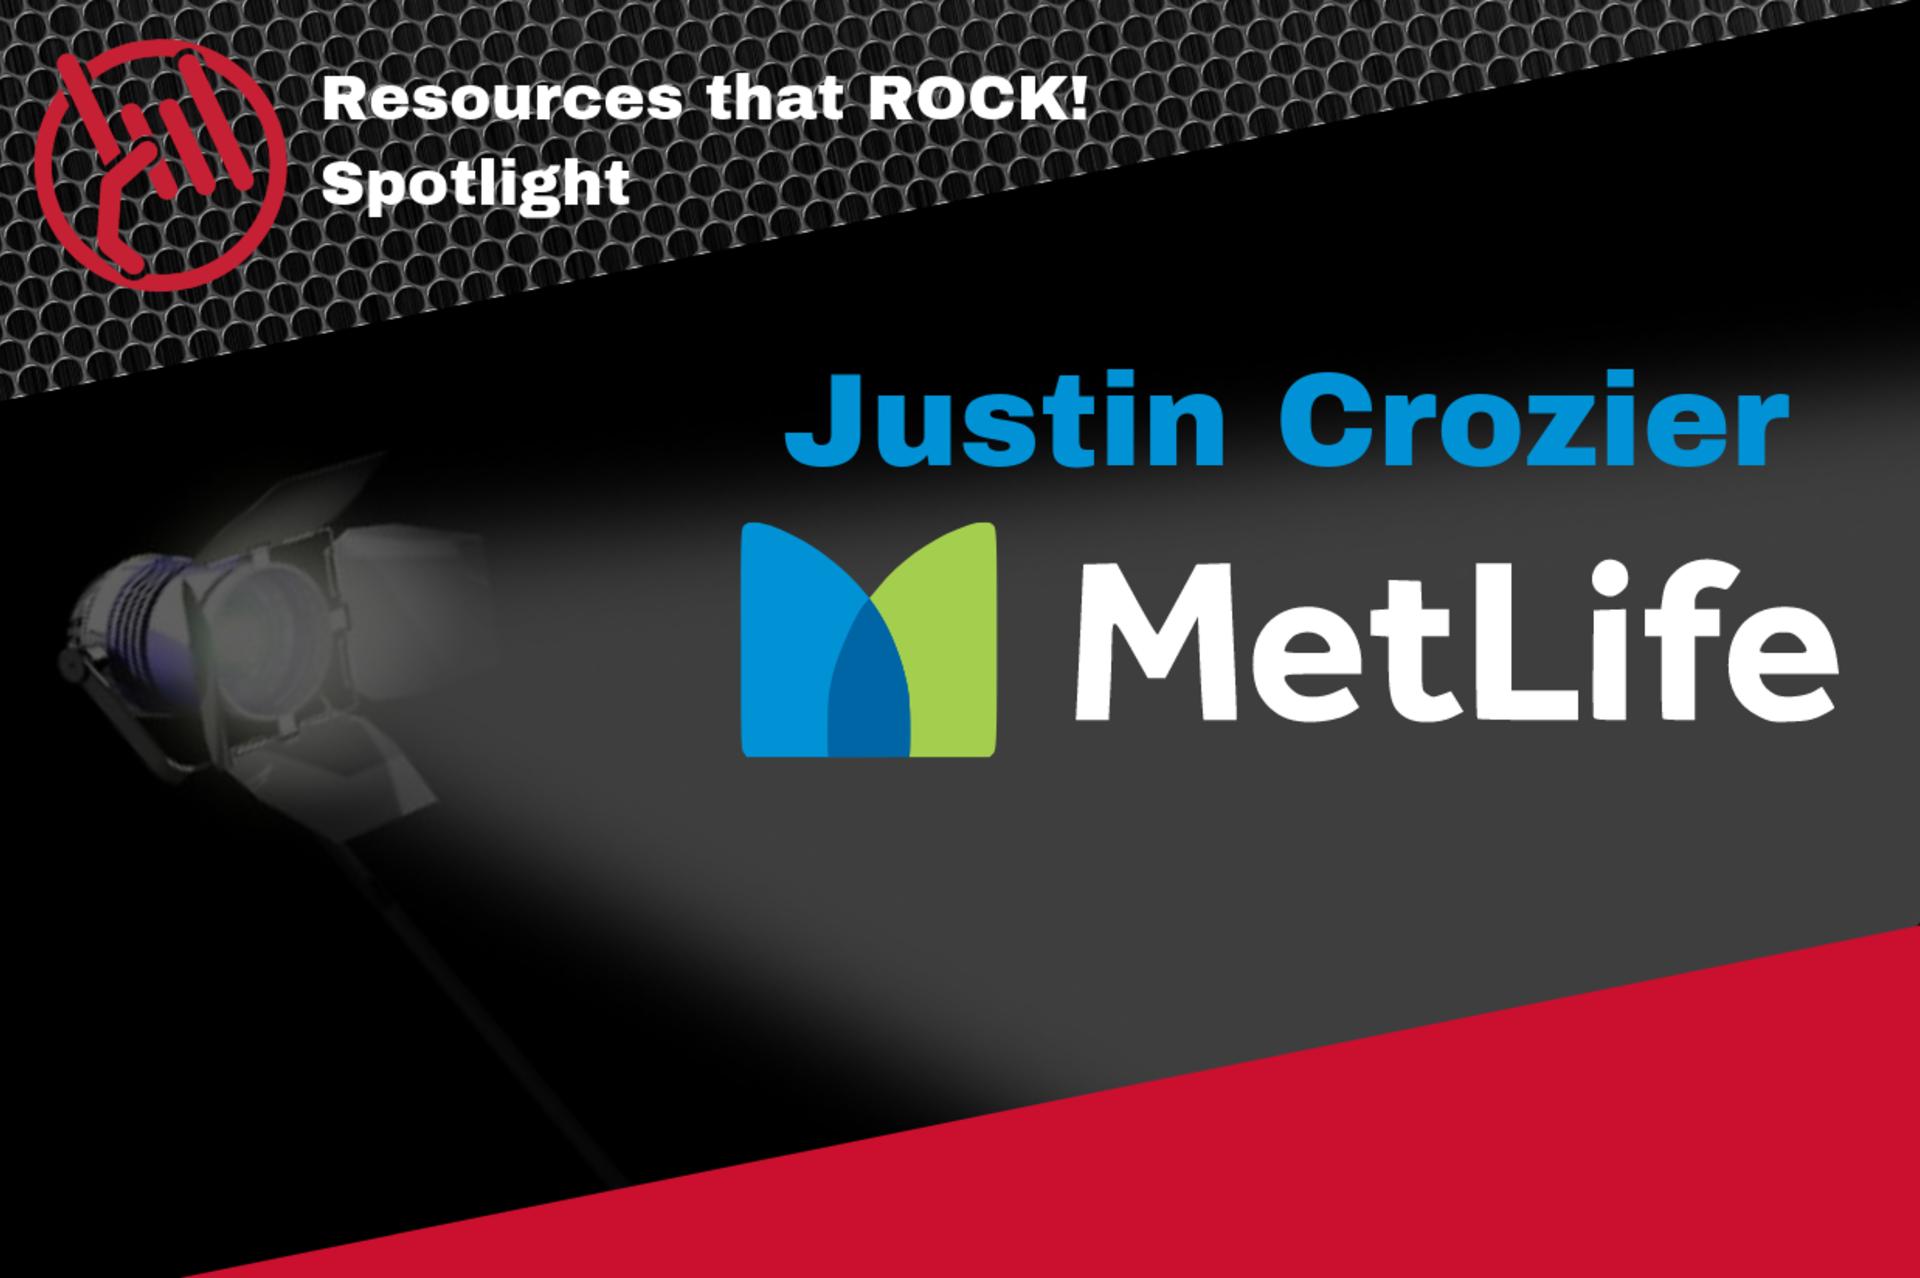 Resources that ROCK! Spotlight – Justin Crozier | Metlife